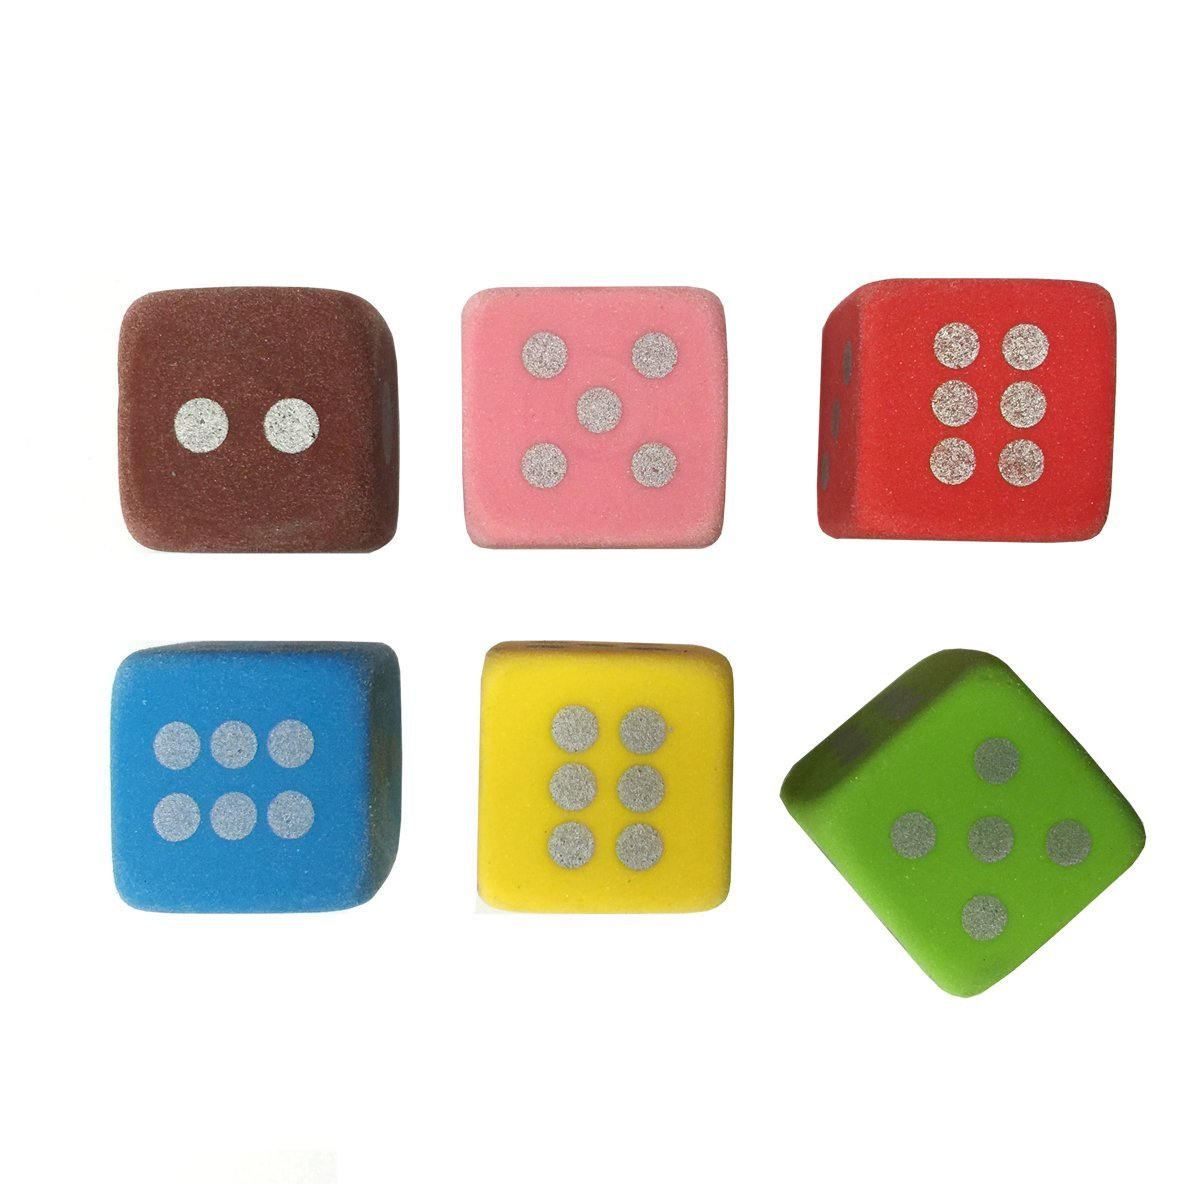 6-pcs Color Dice Eraser Set UNI Gifts Shop